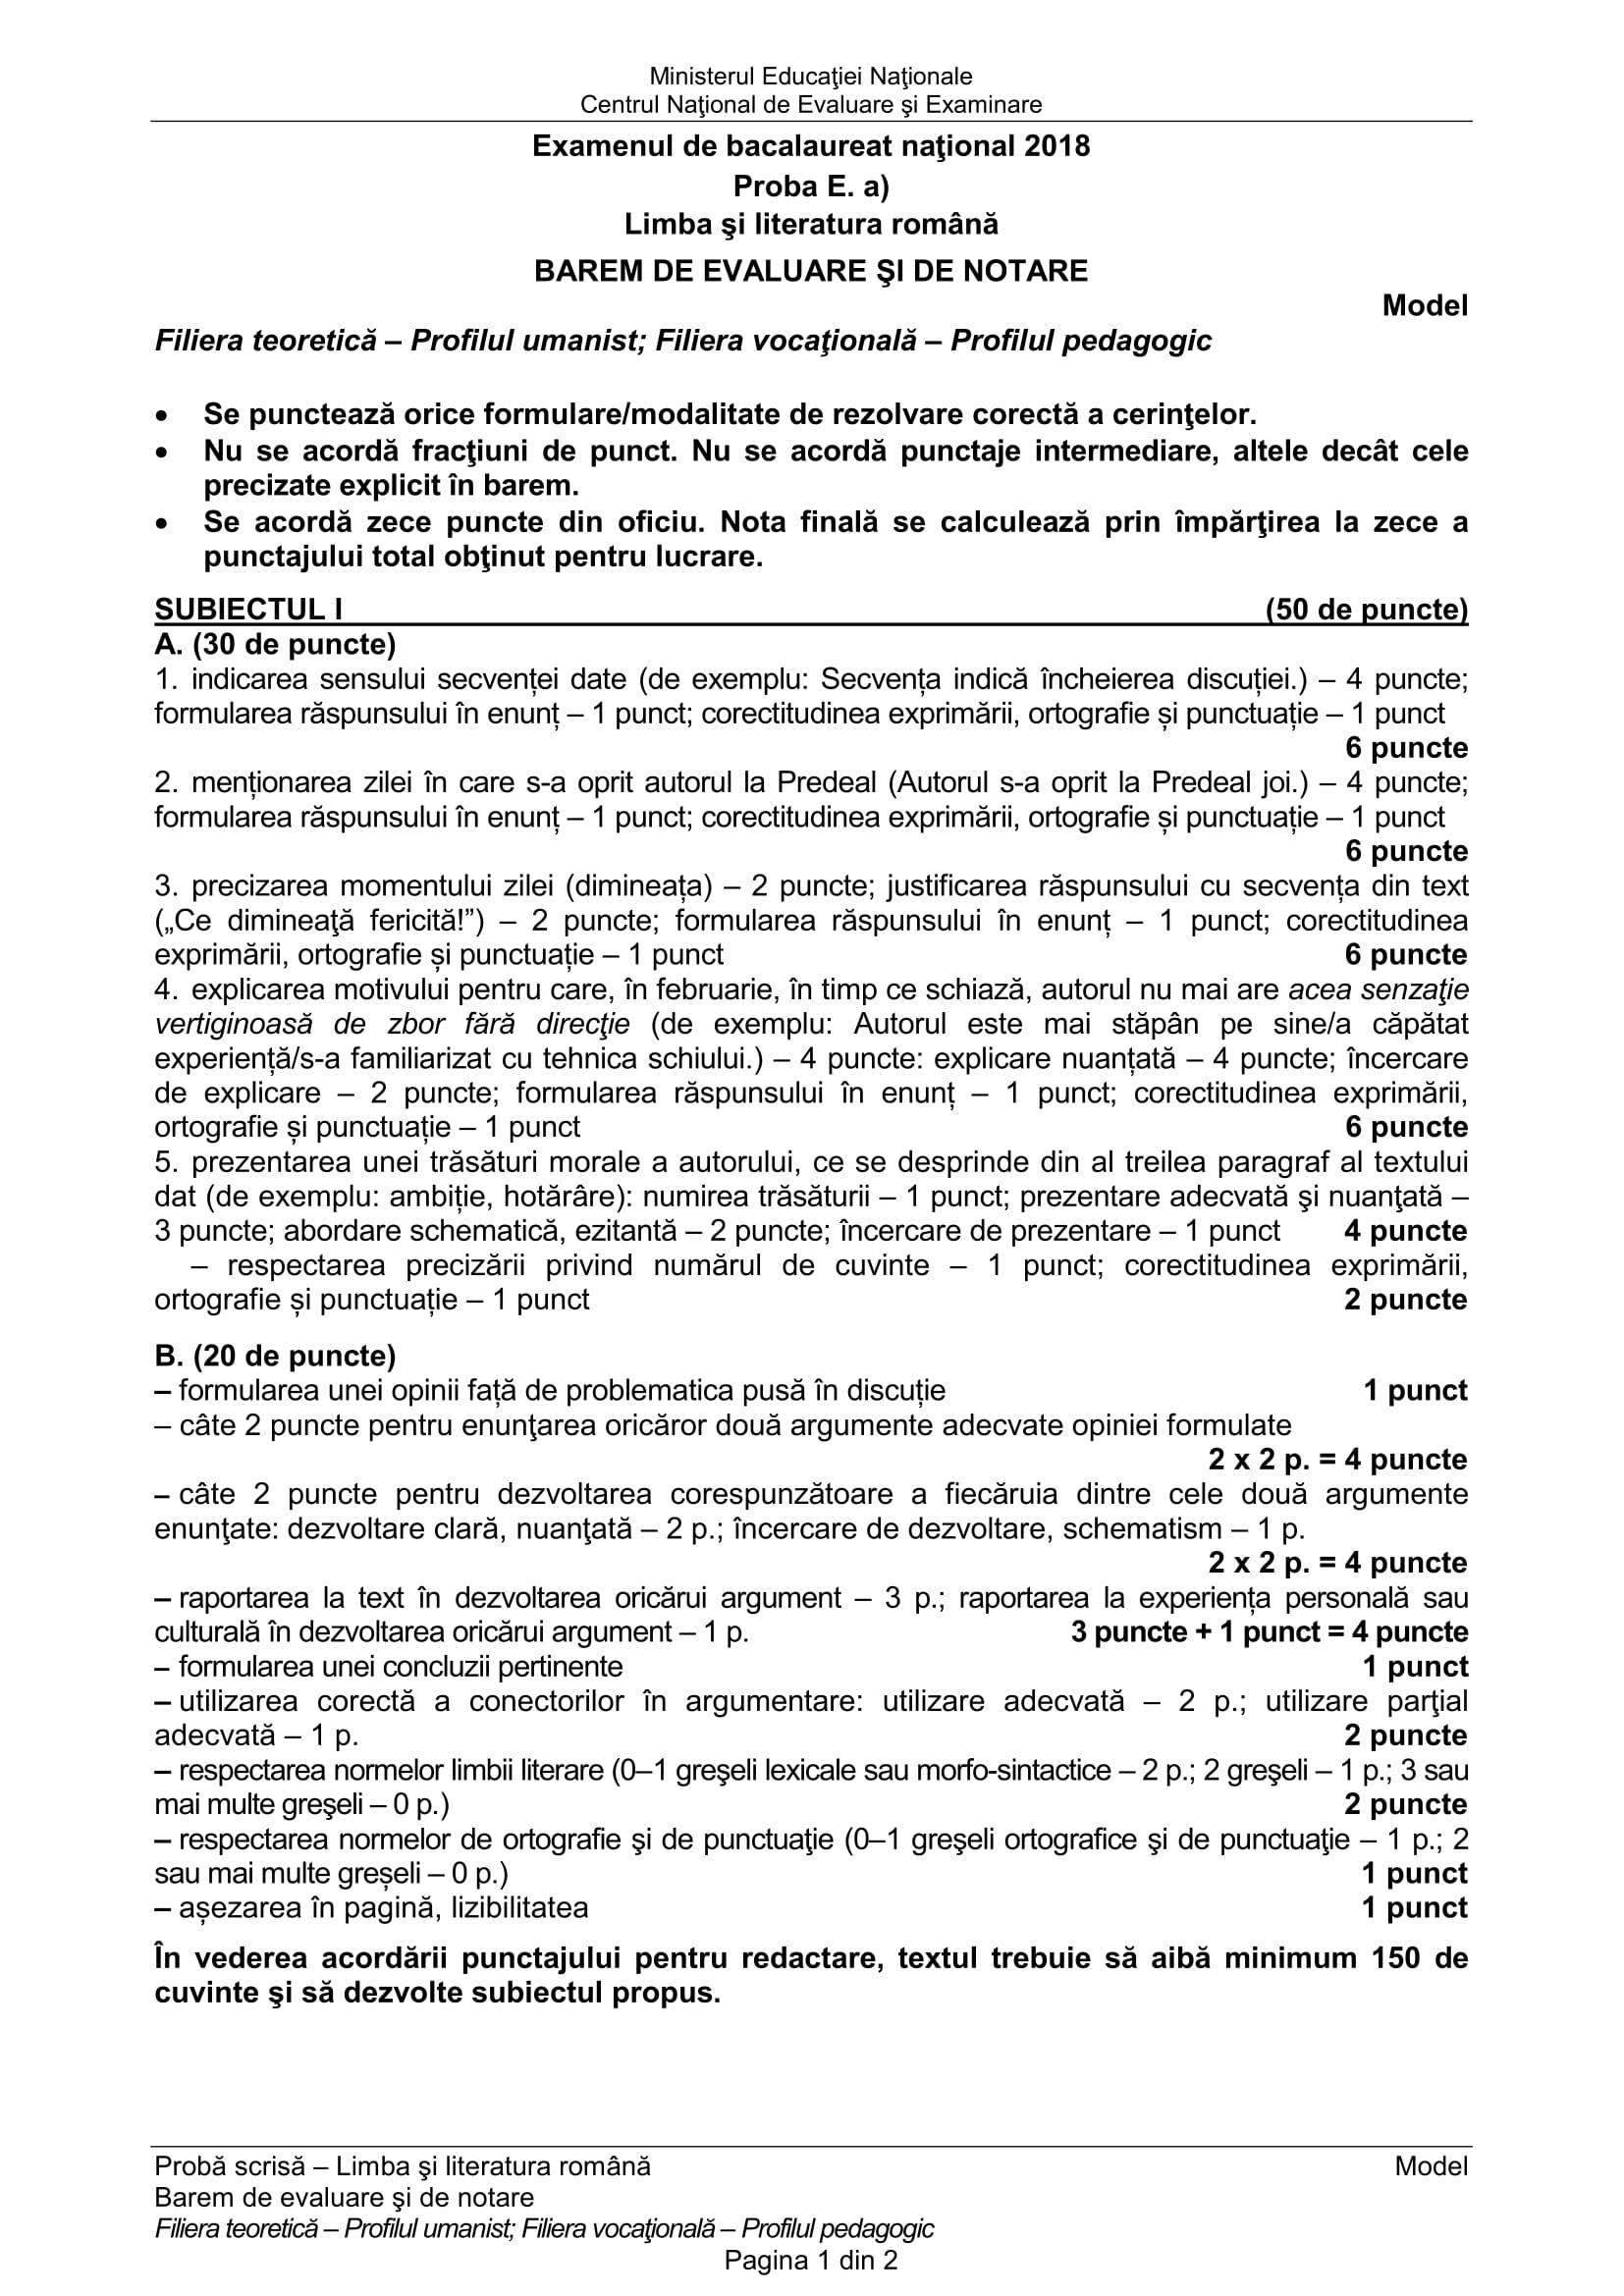 E_a_romana_uman_ped_2018_bar_model-1